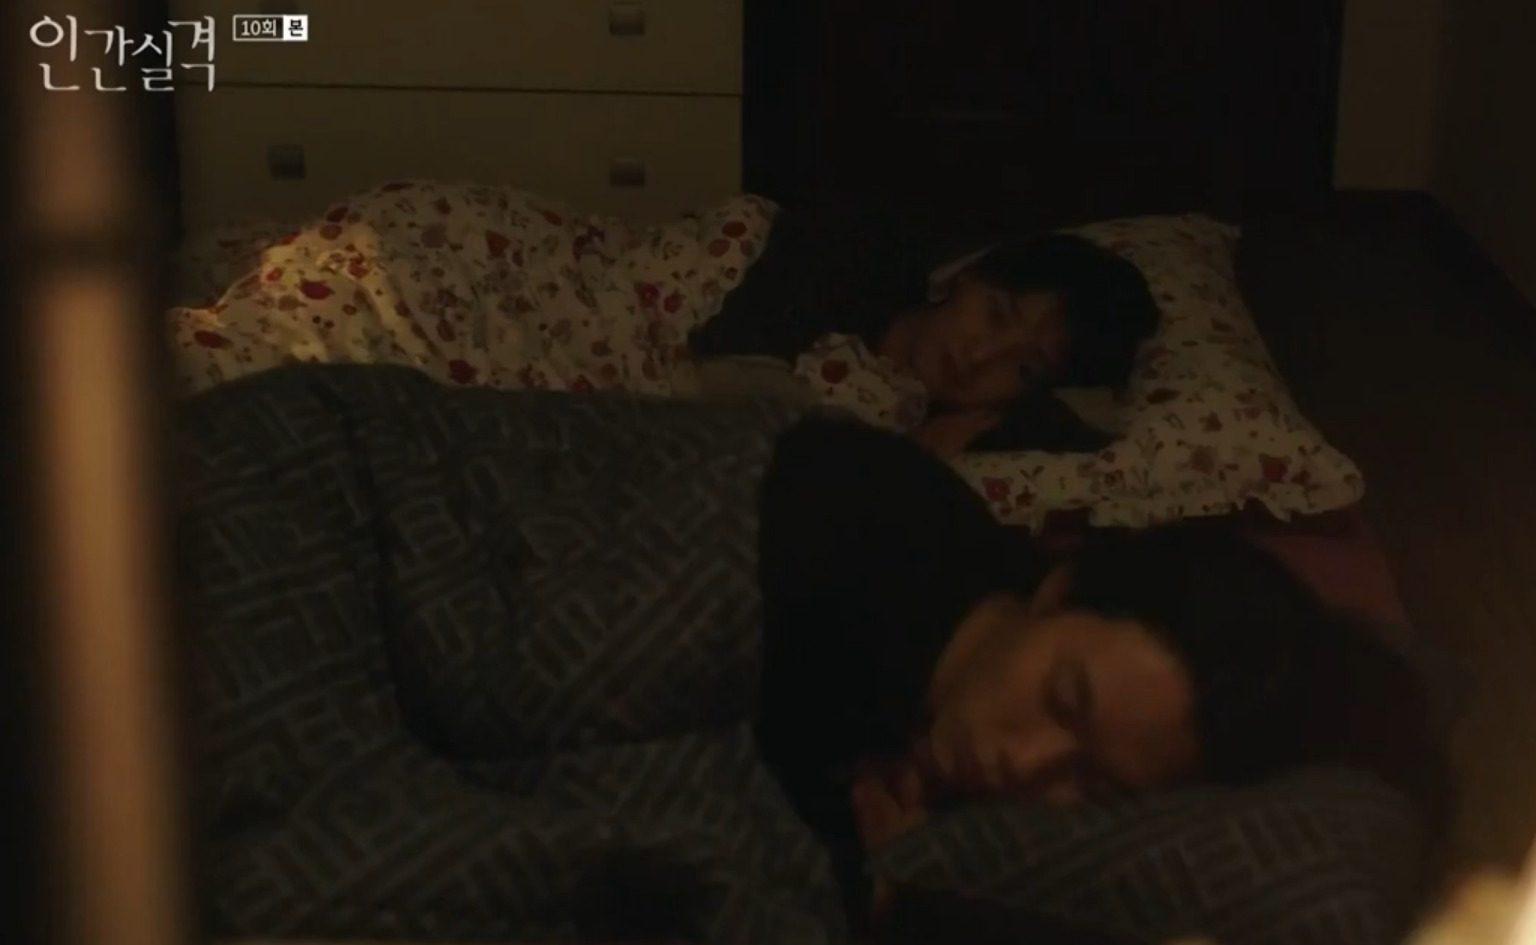 Lost K-drama Episode 11